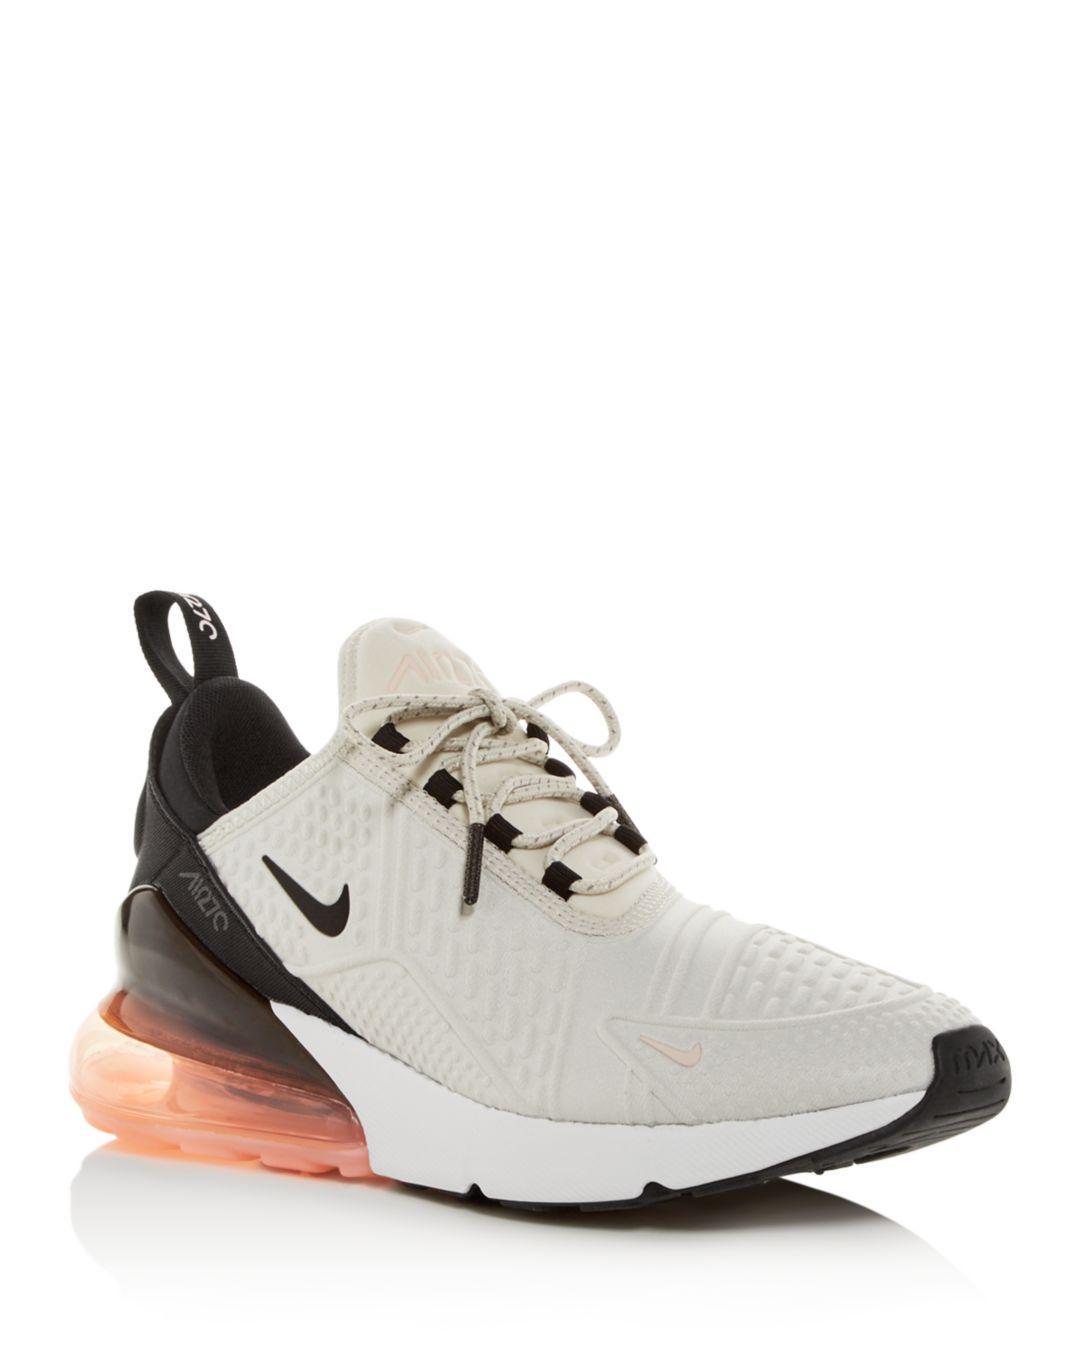 best sneakers ffa30 013f4 Lyst - Nike Women s Air Max 270 Low-top Sneakers